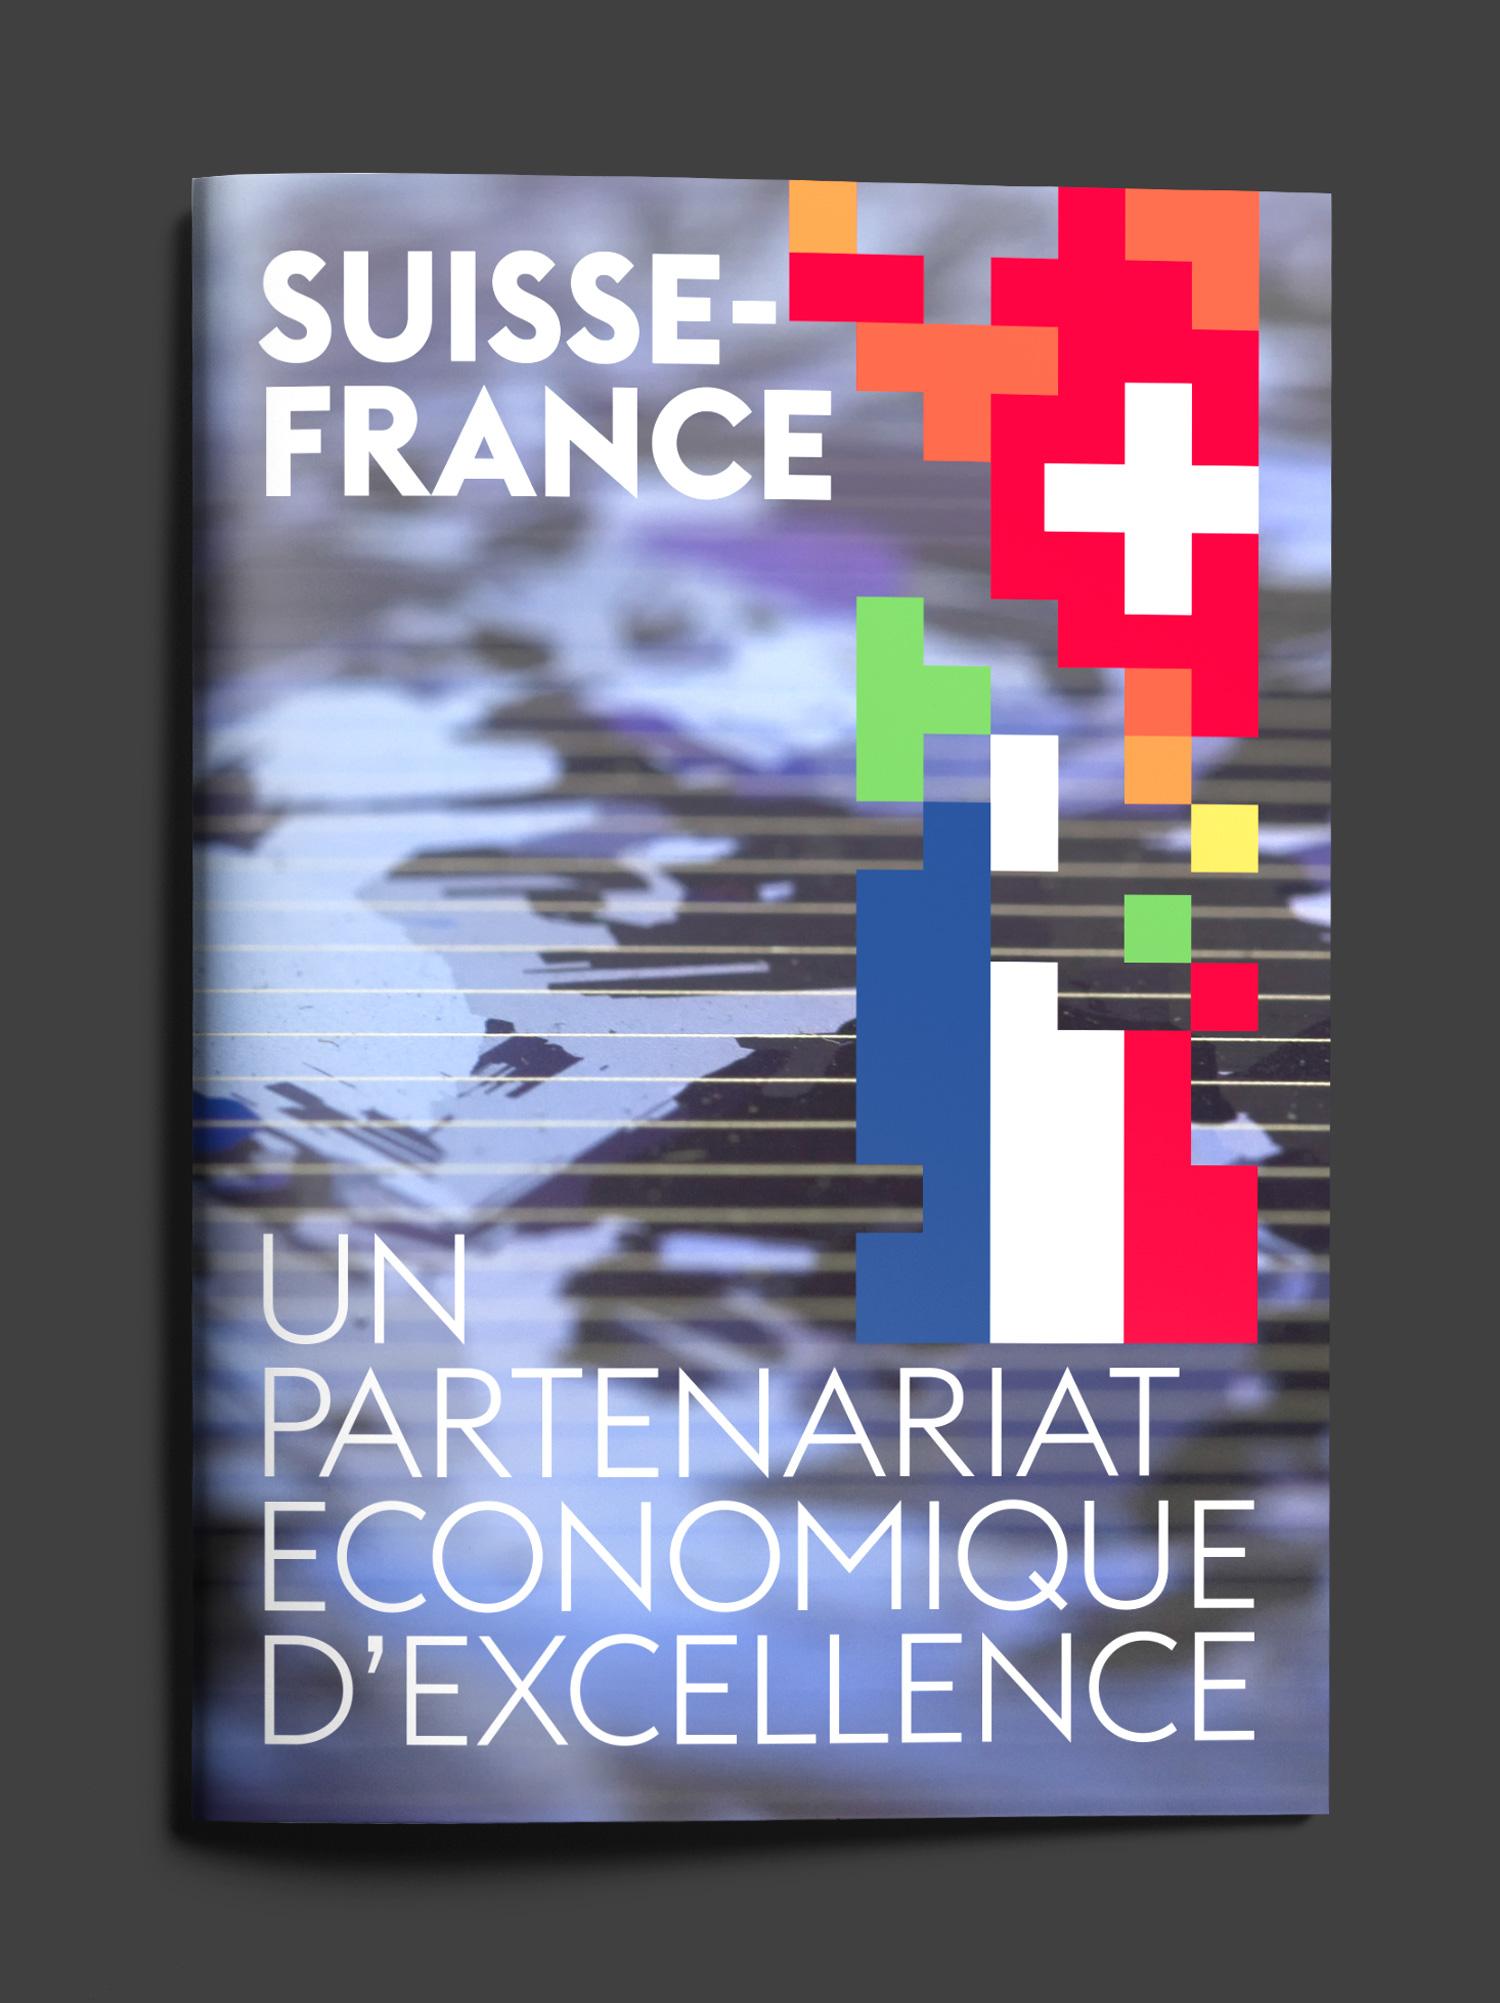 Brochure Ambassade de Suisse en France - Design Agence Si - Studio irresistible Paris